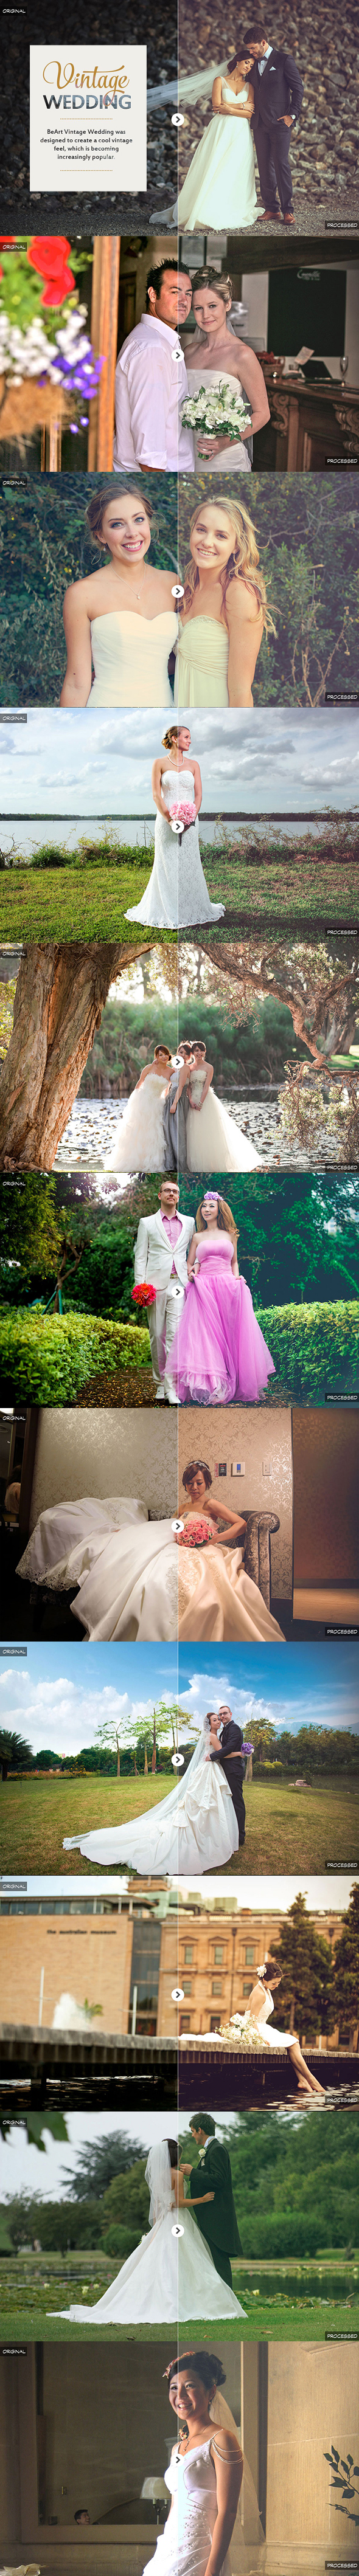 GraphicRiver Vintage Wedding Photoshop Actions 20857281